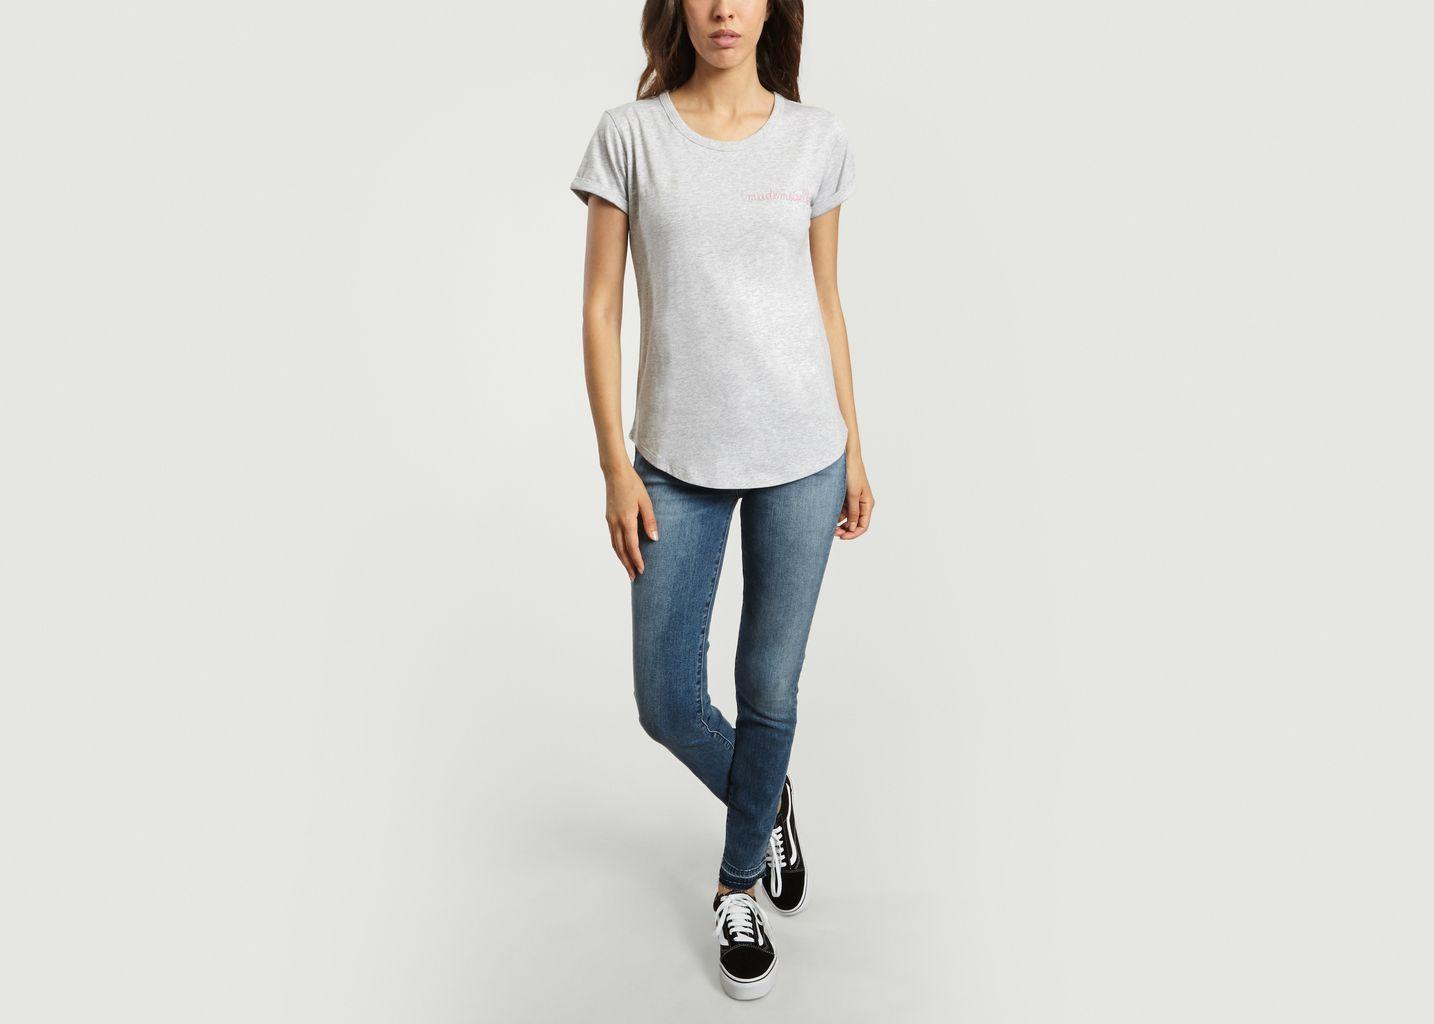 T-Shirt Mademoiselle - Maison Labiche